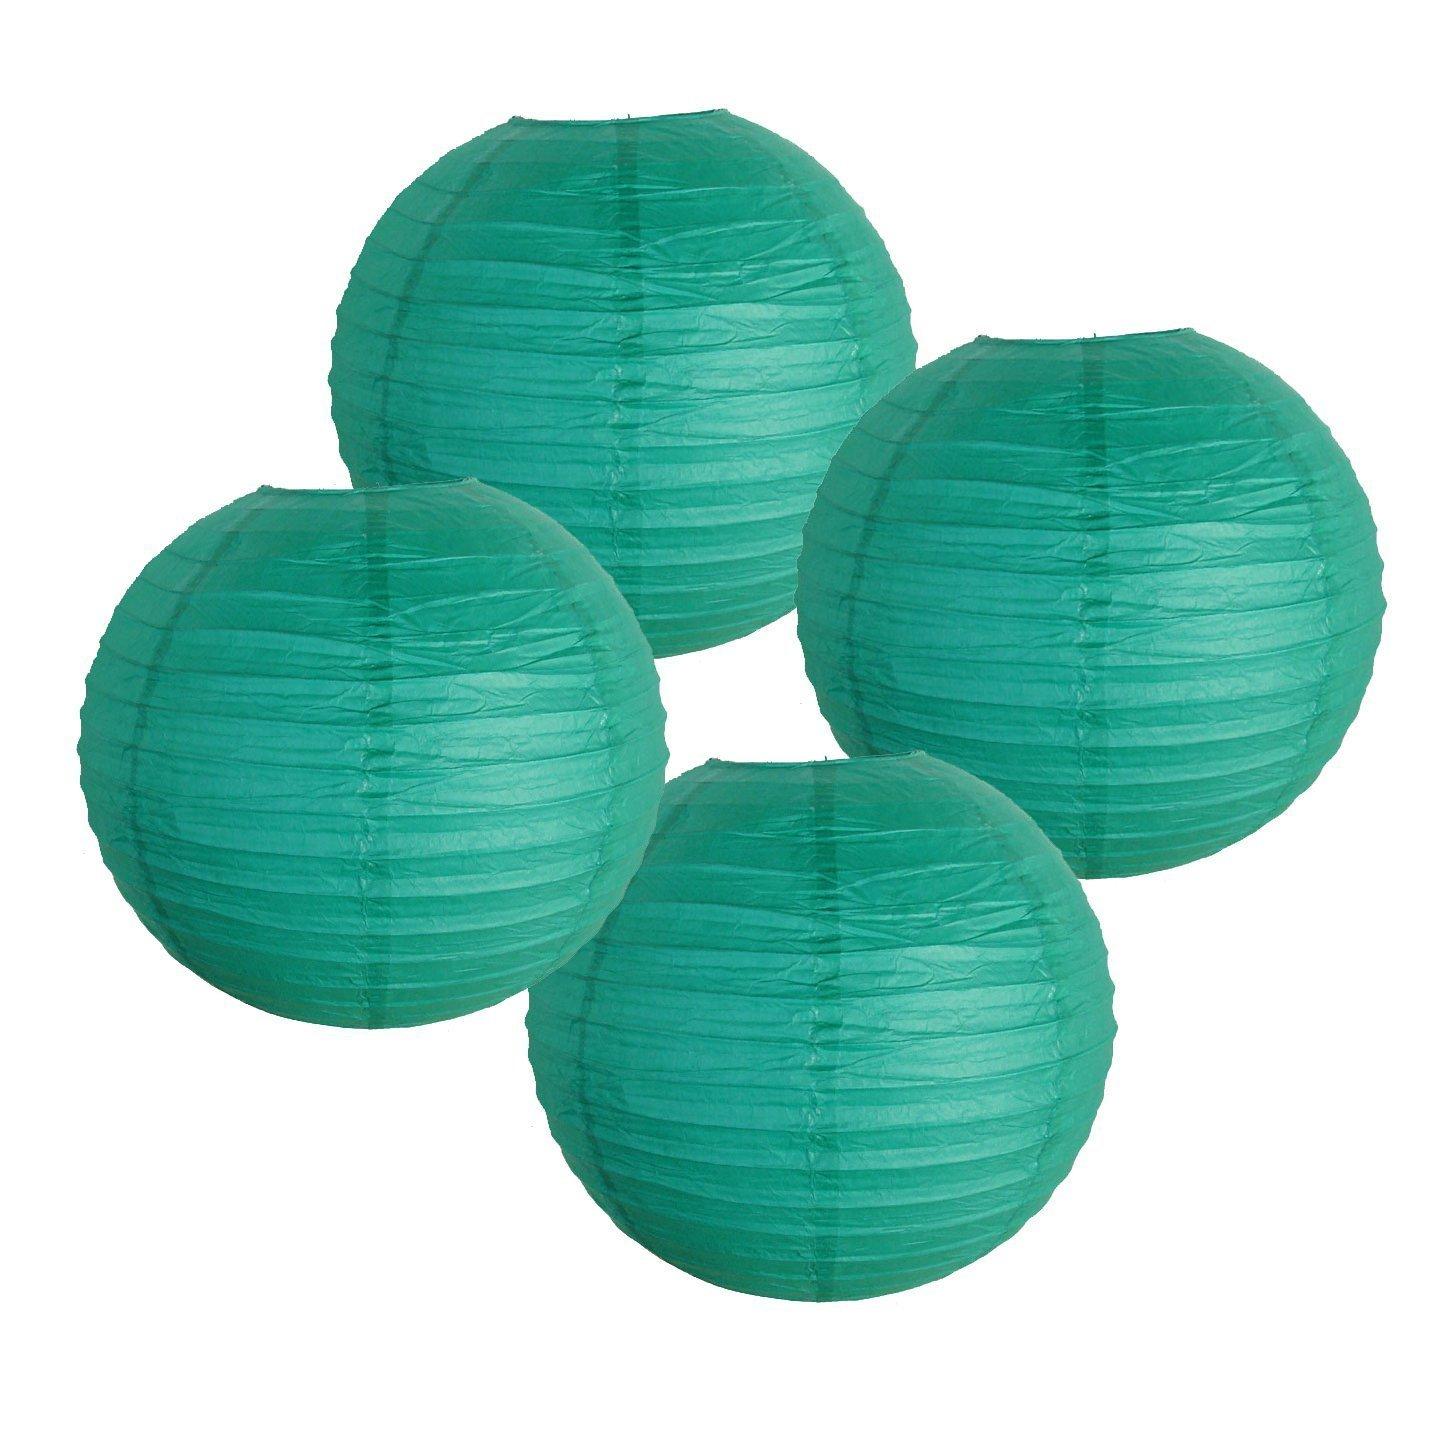 Just Artifacts 様々な紙製ランタン(色とサイズの異なる紙のランタン) 8inch AMZ-RPL4-080061 B01EGXKGUU 8inch|Teal Blue Green Teal Blue Green 8inch